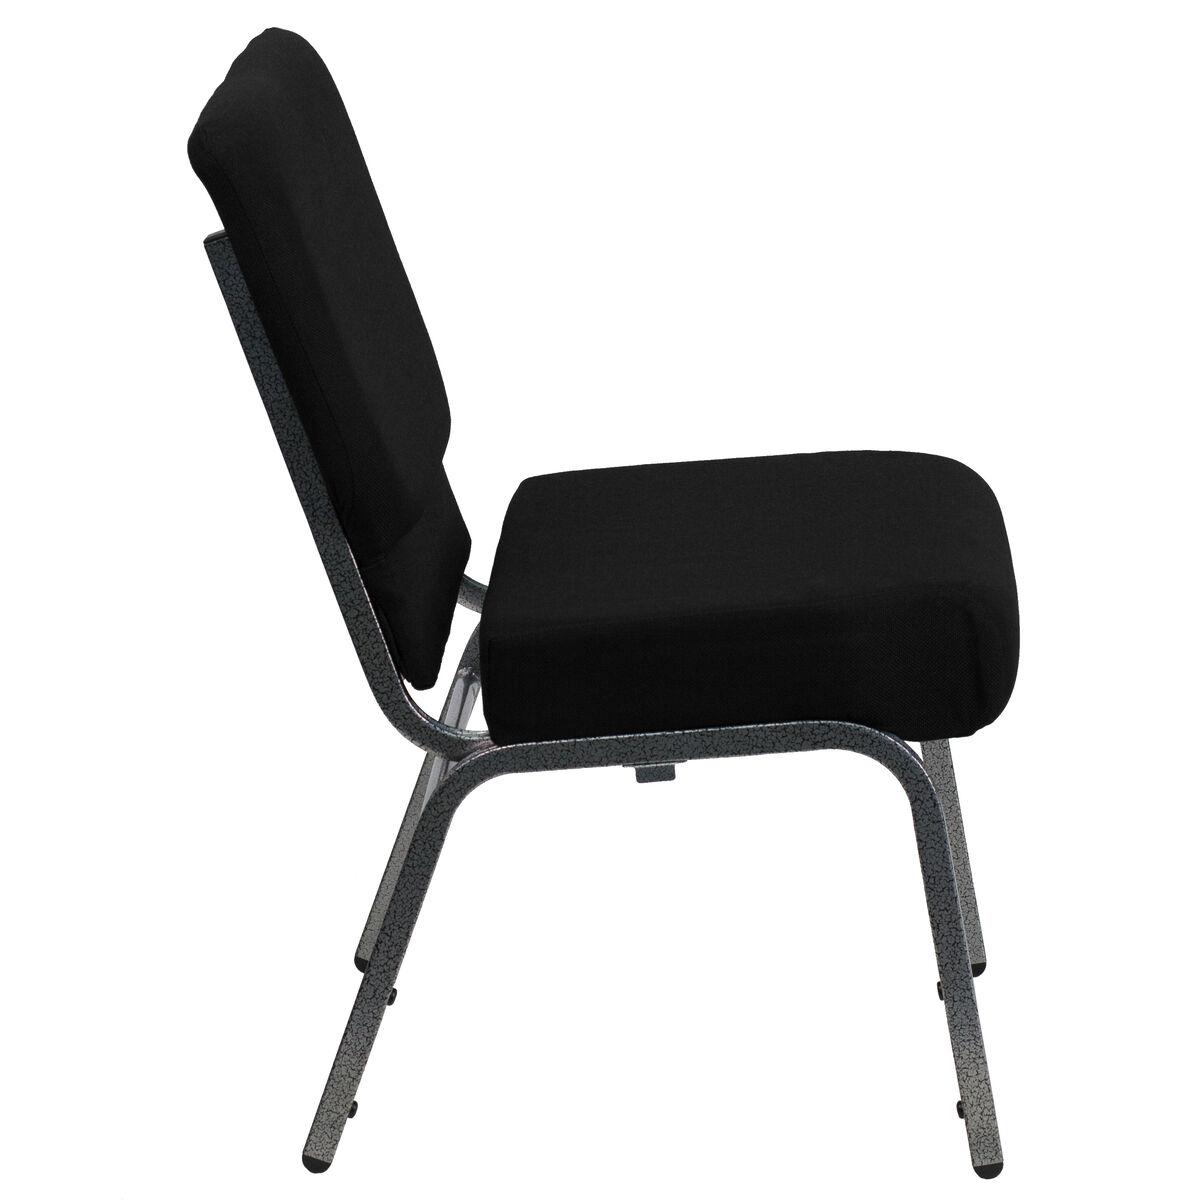 Hercules Series 21 W Stacking Church Chair In Black